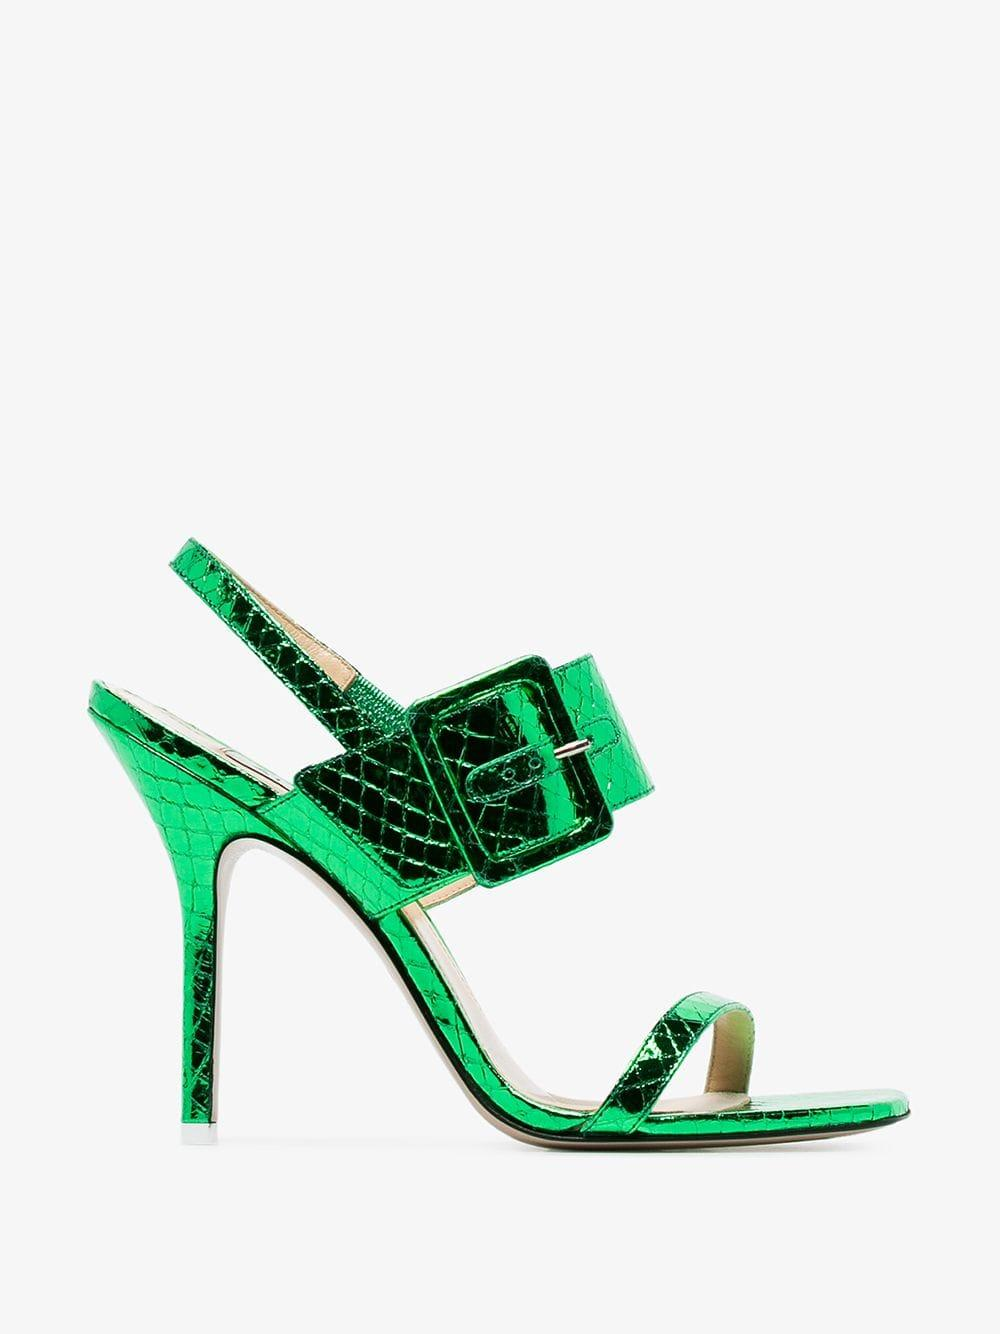 4308a7c664 Attico - Green Mariah Python Napa Heel - Lyst. View fullscreen